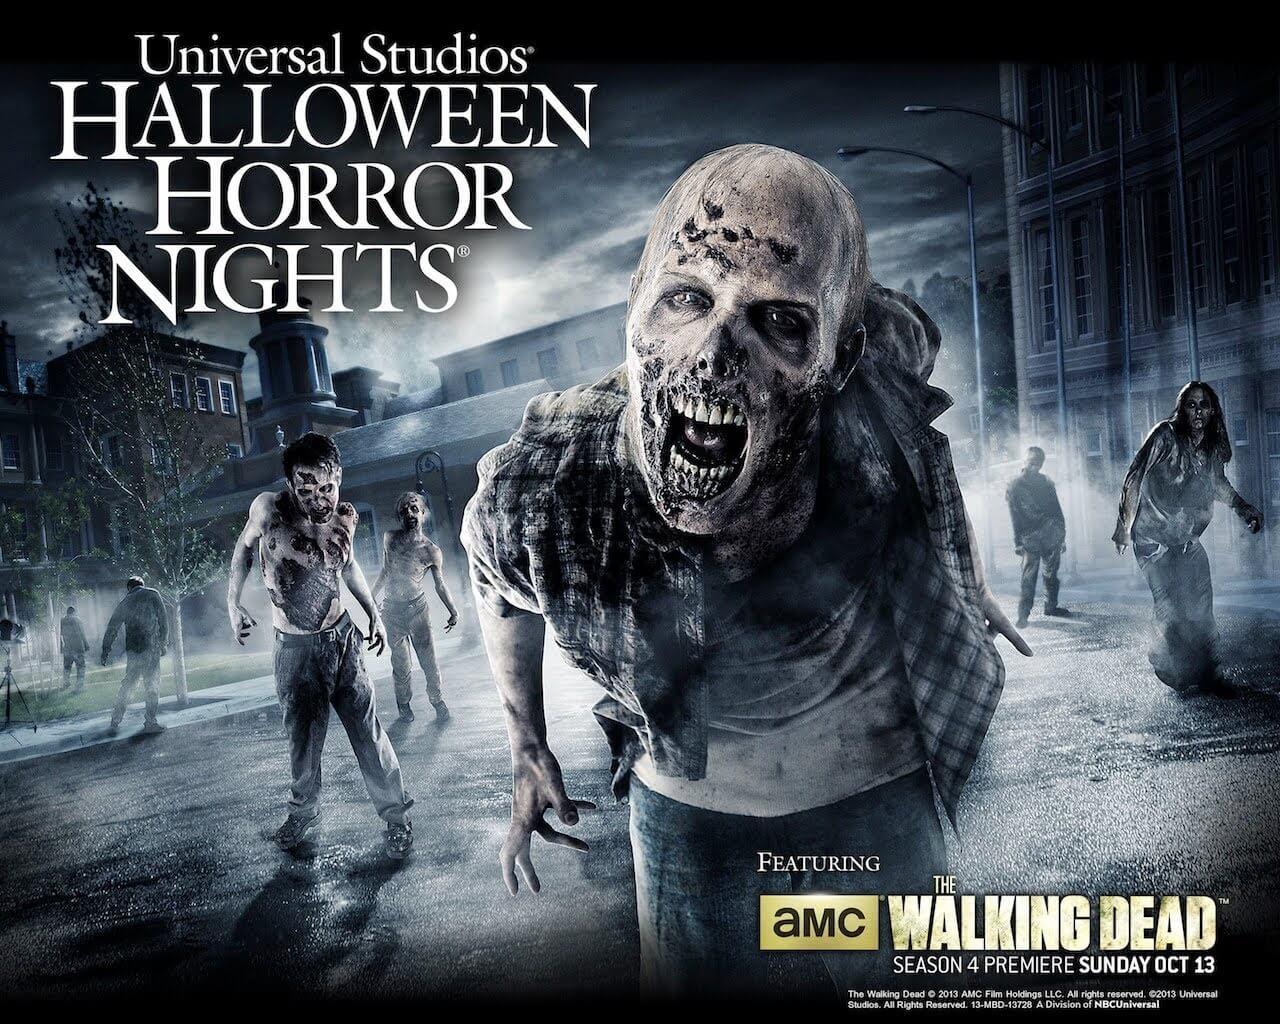 Walking Dead returns like you've never seen it before to Halloween ...